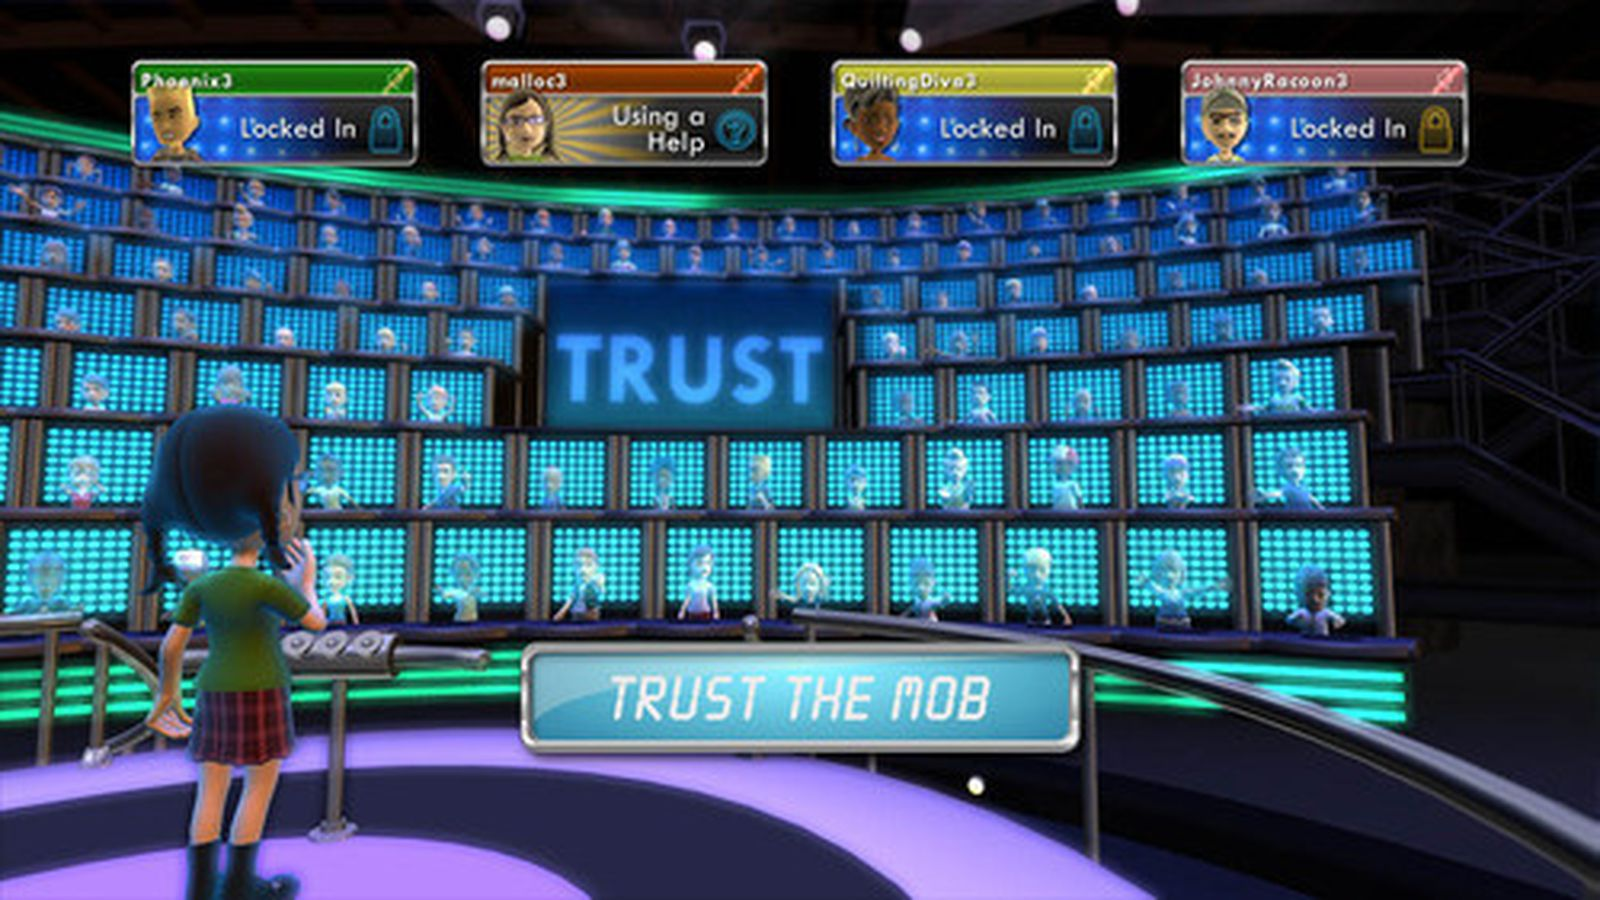 Microsoft Something Like 1 Vs 100 Coming To Xbox One